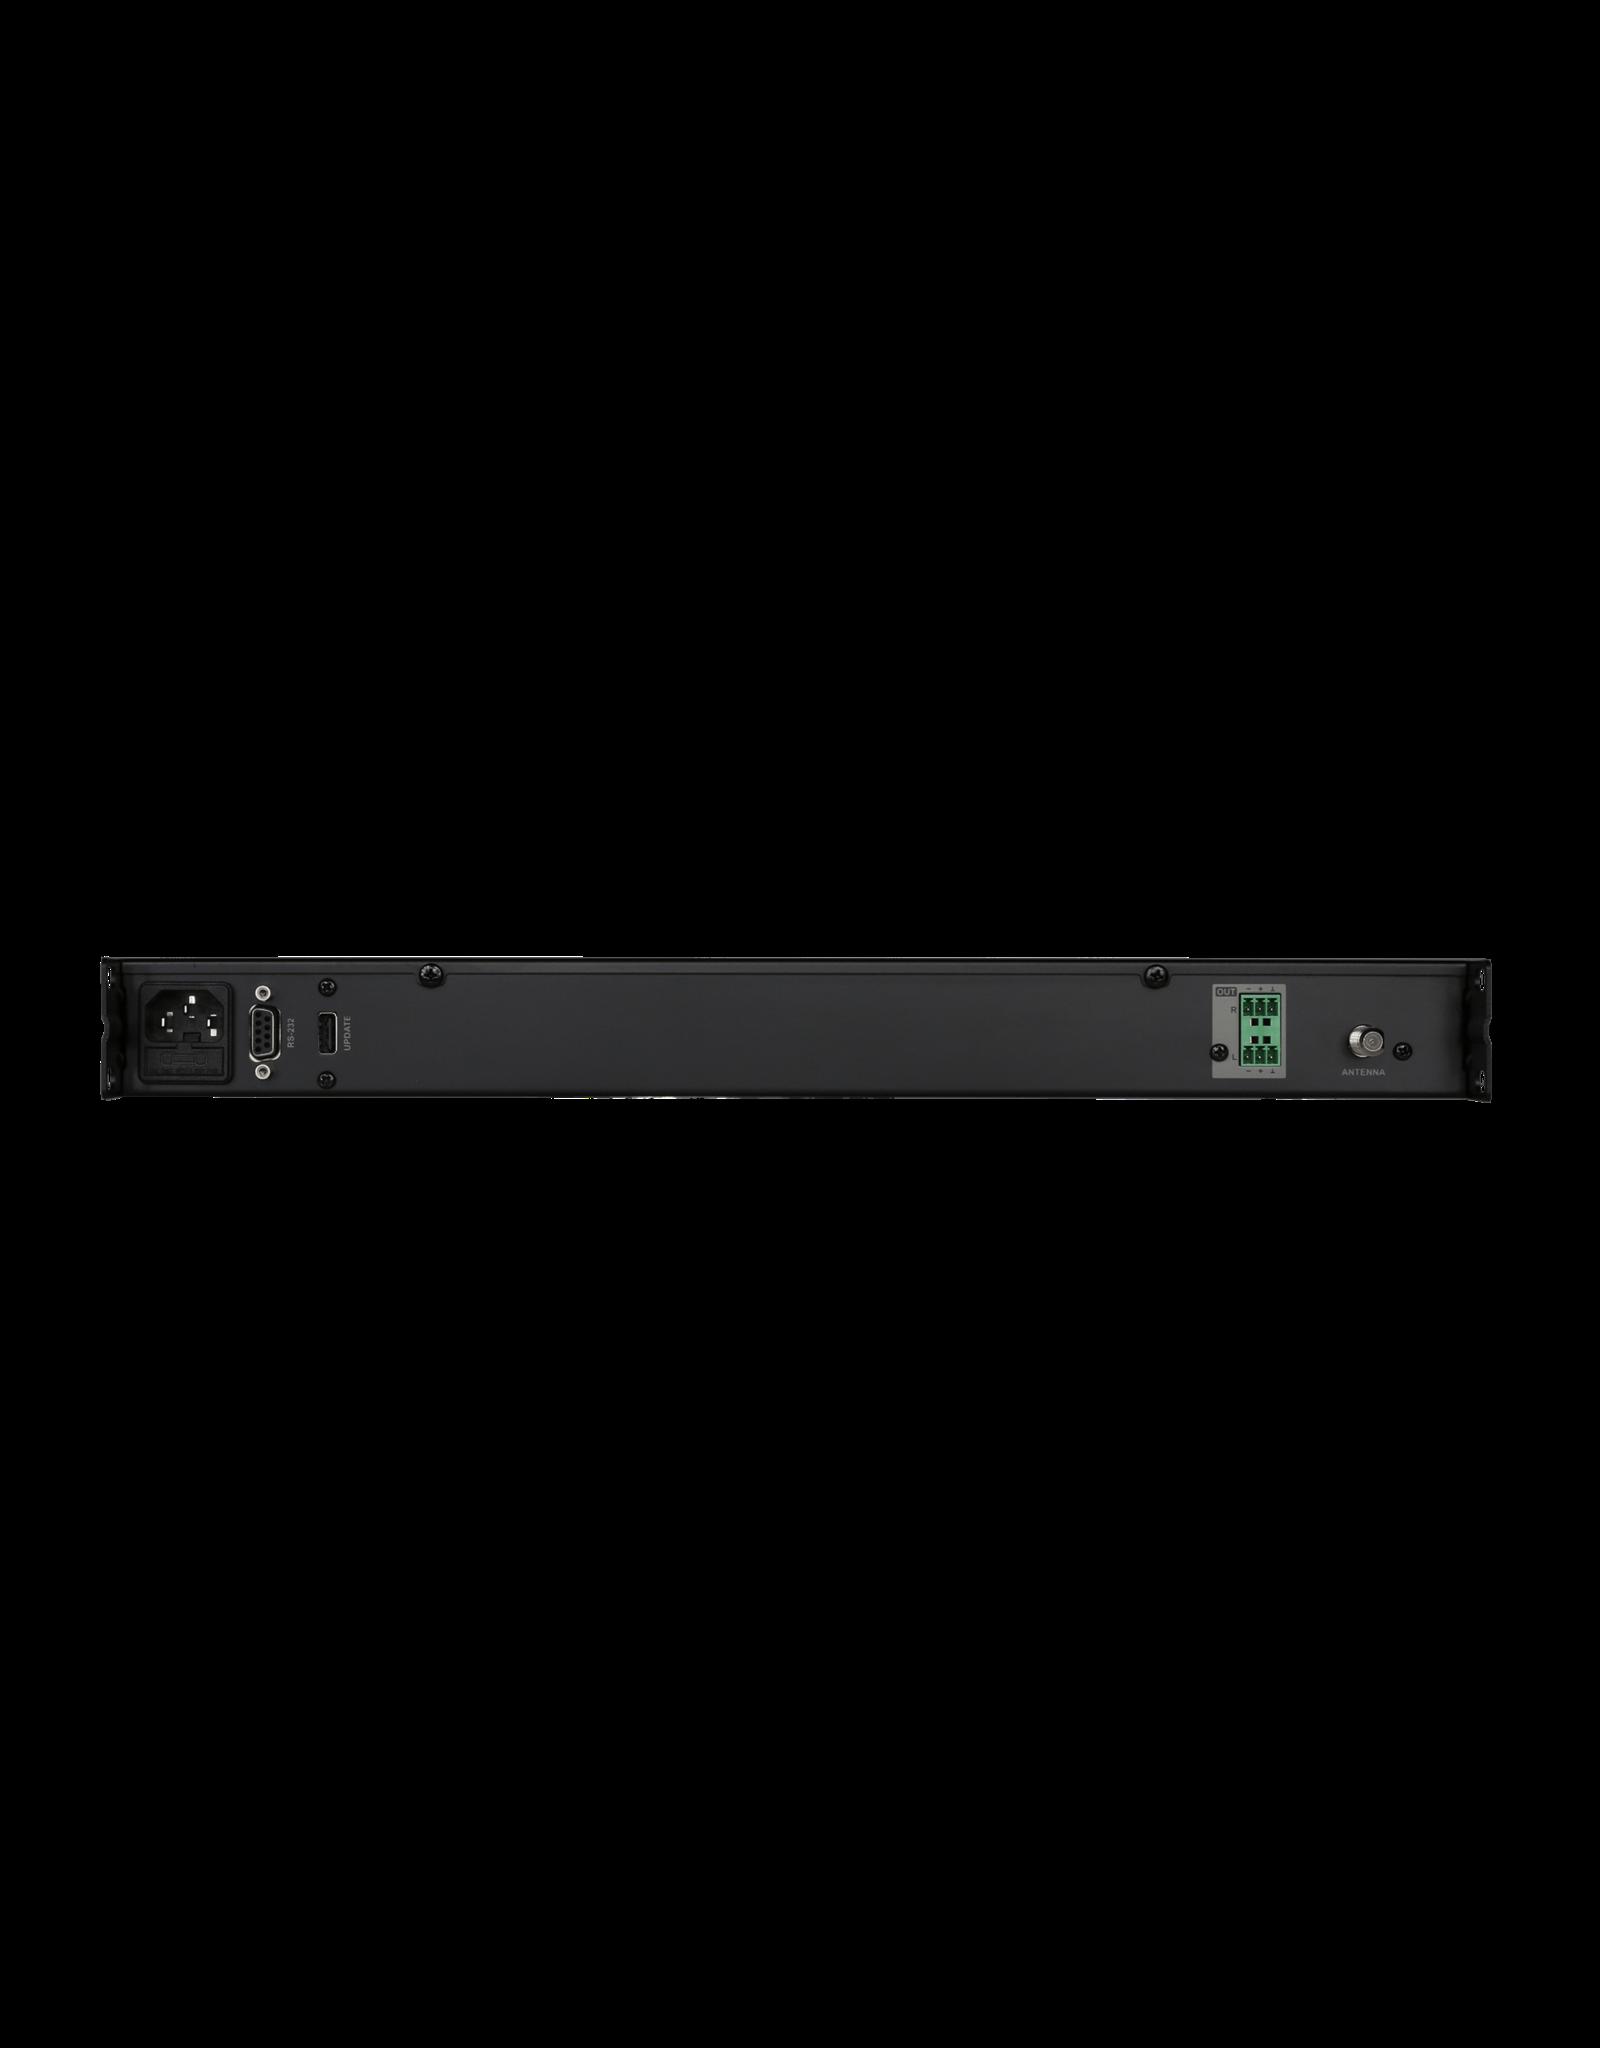 Audac DAB/DAB+/FM tuner